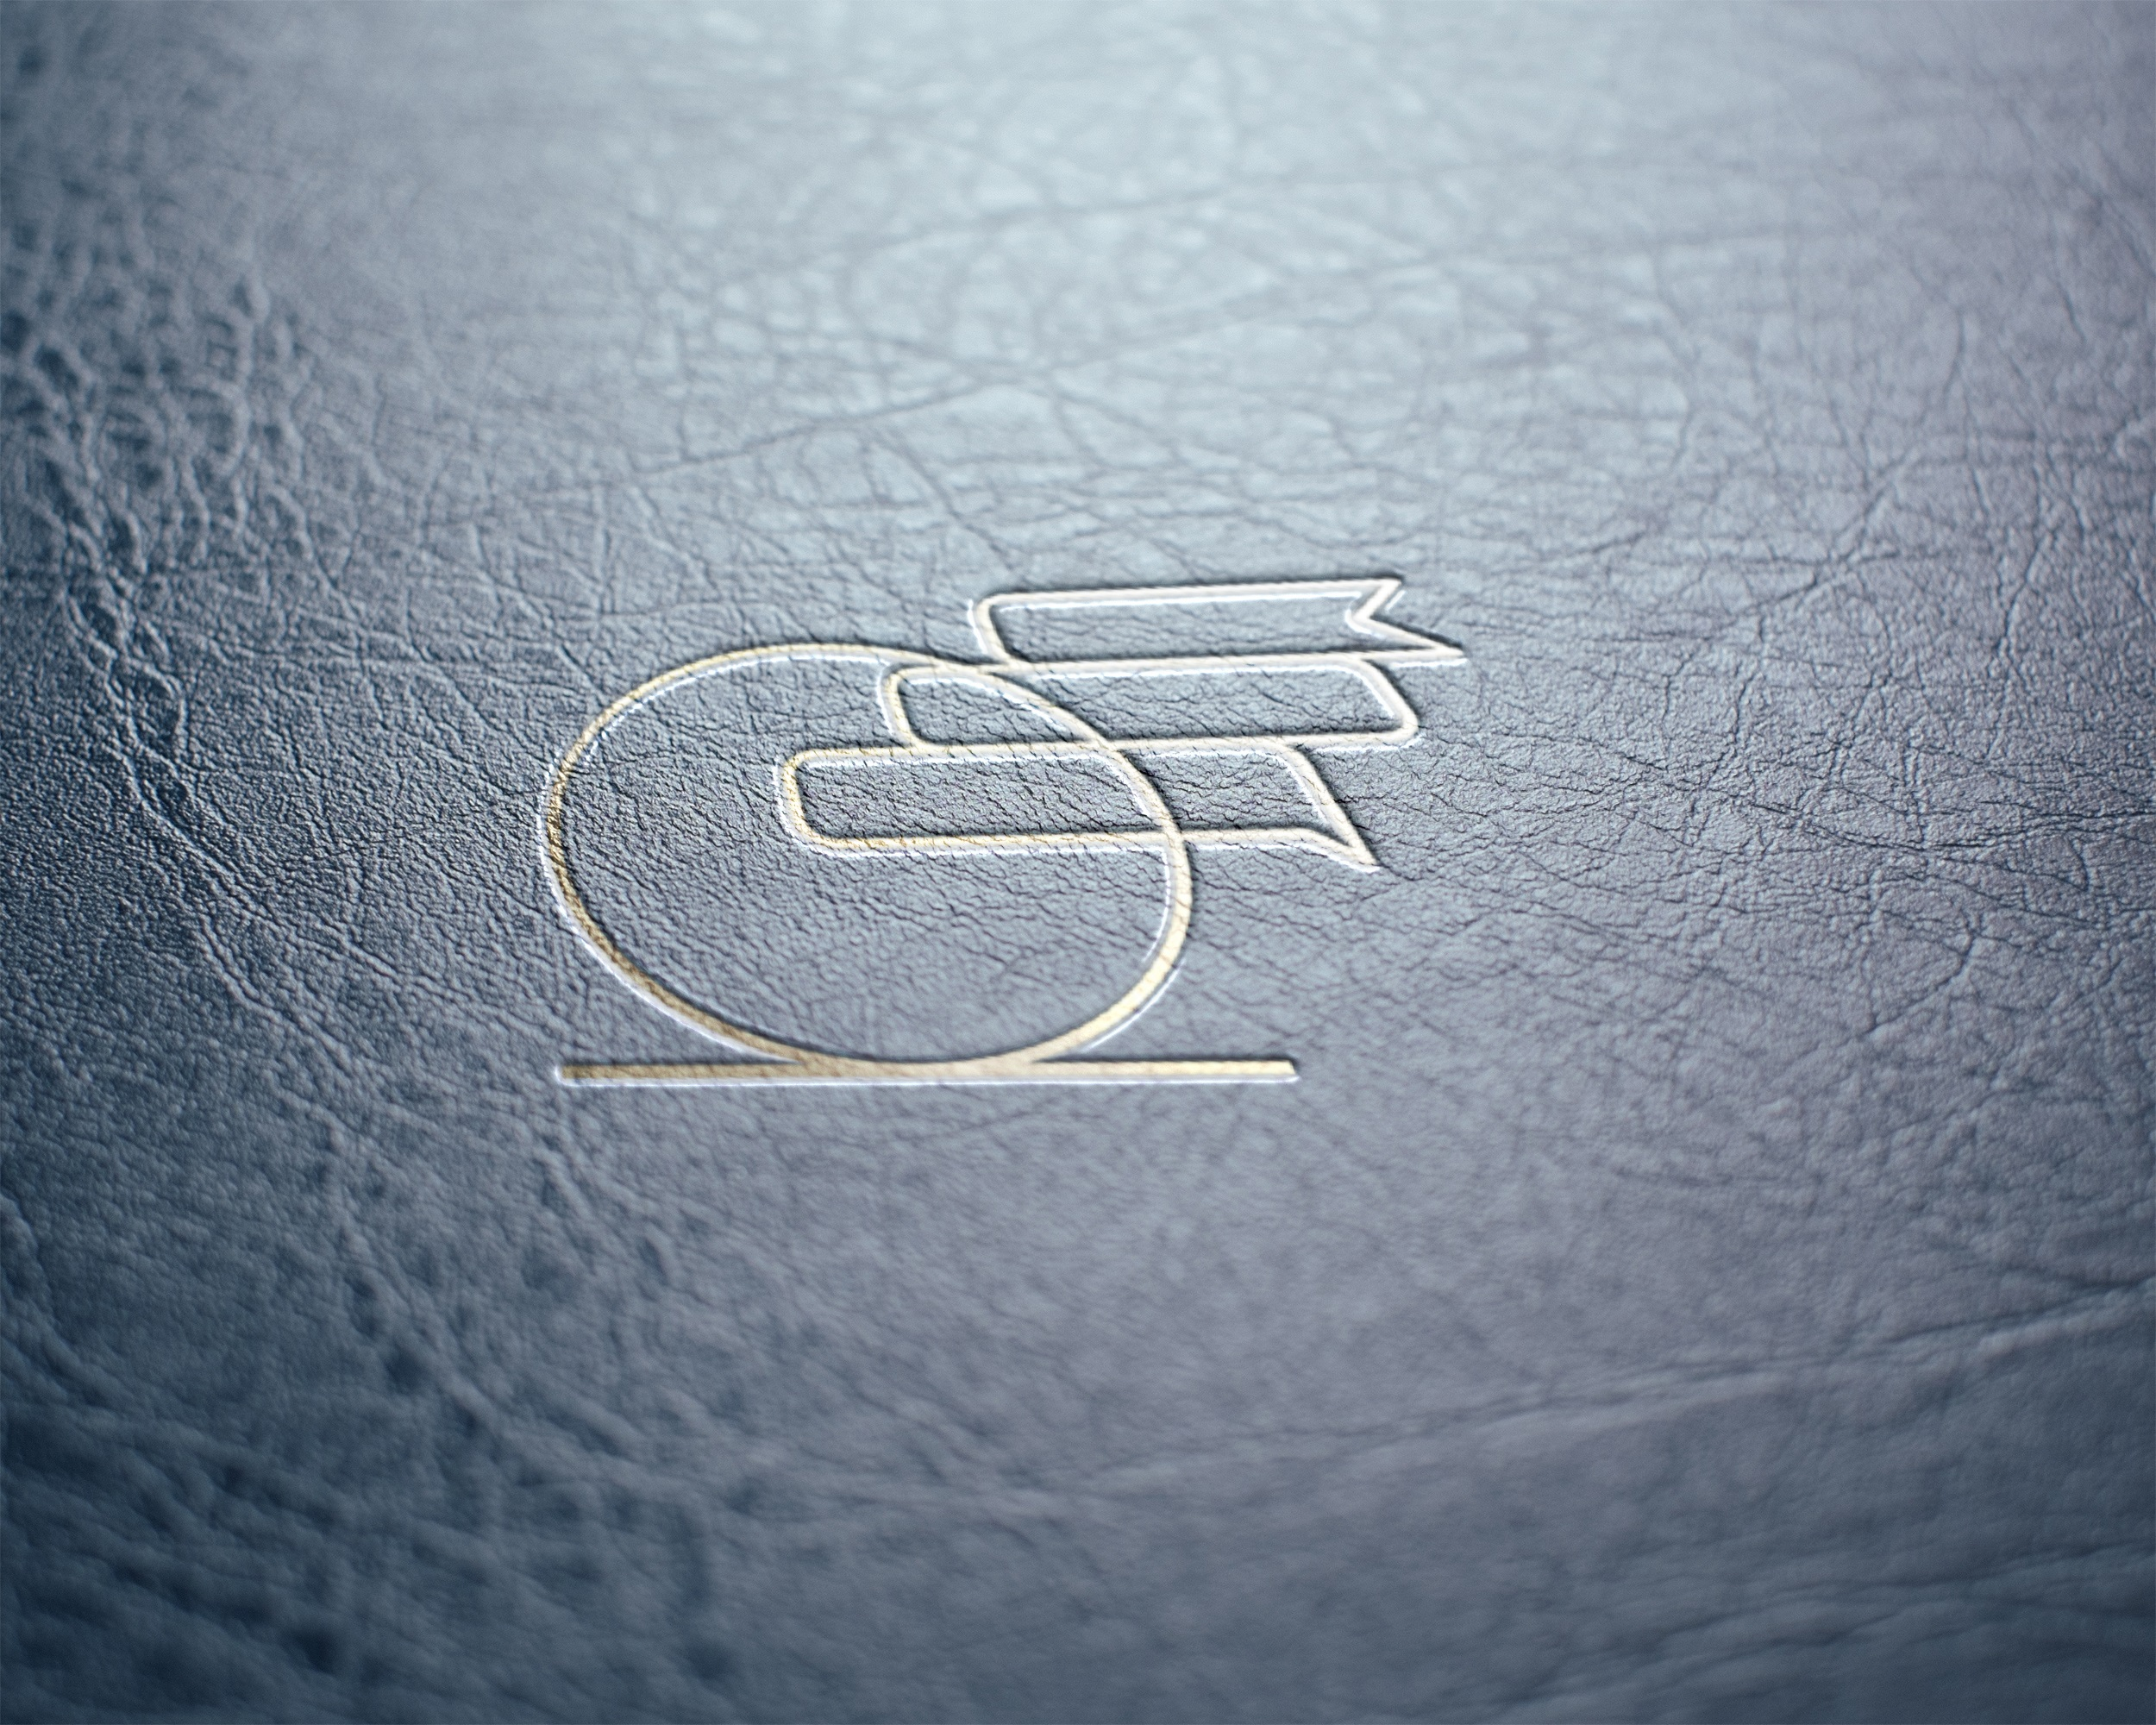 Придумать концепцию логотипа группы компаний фото f_5855b759c3d80890.jpg